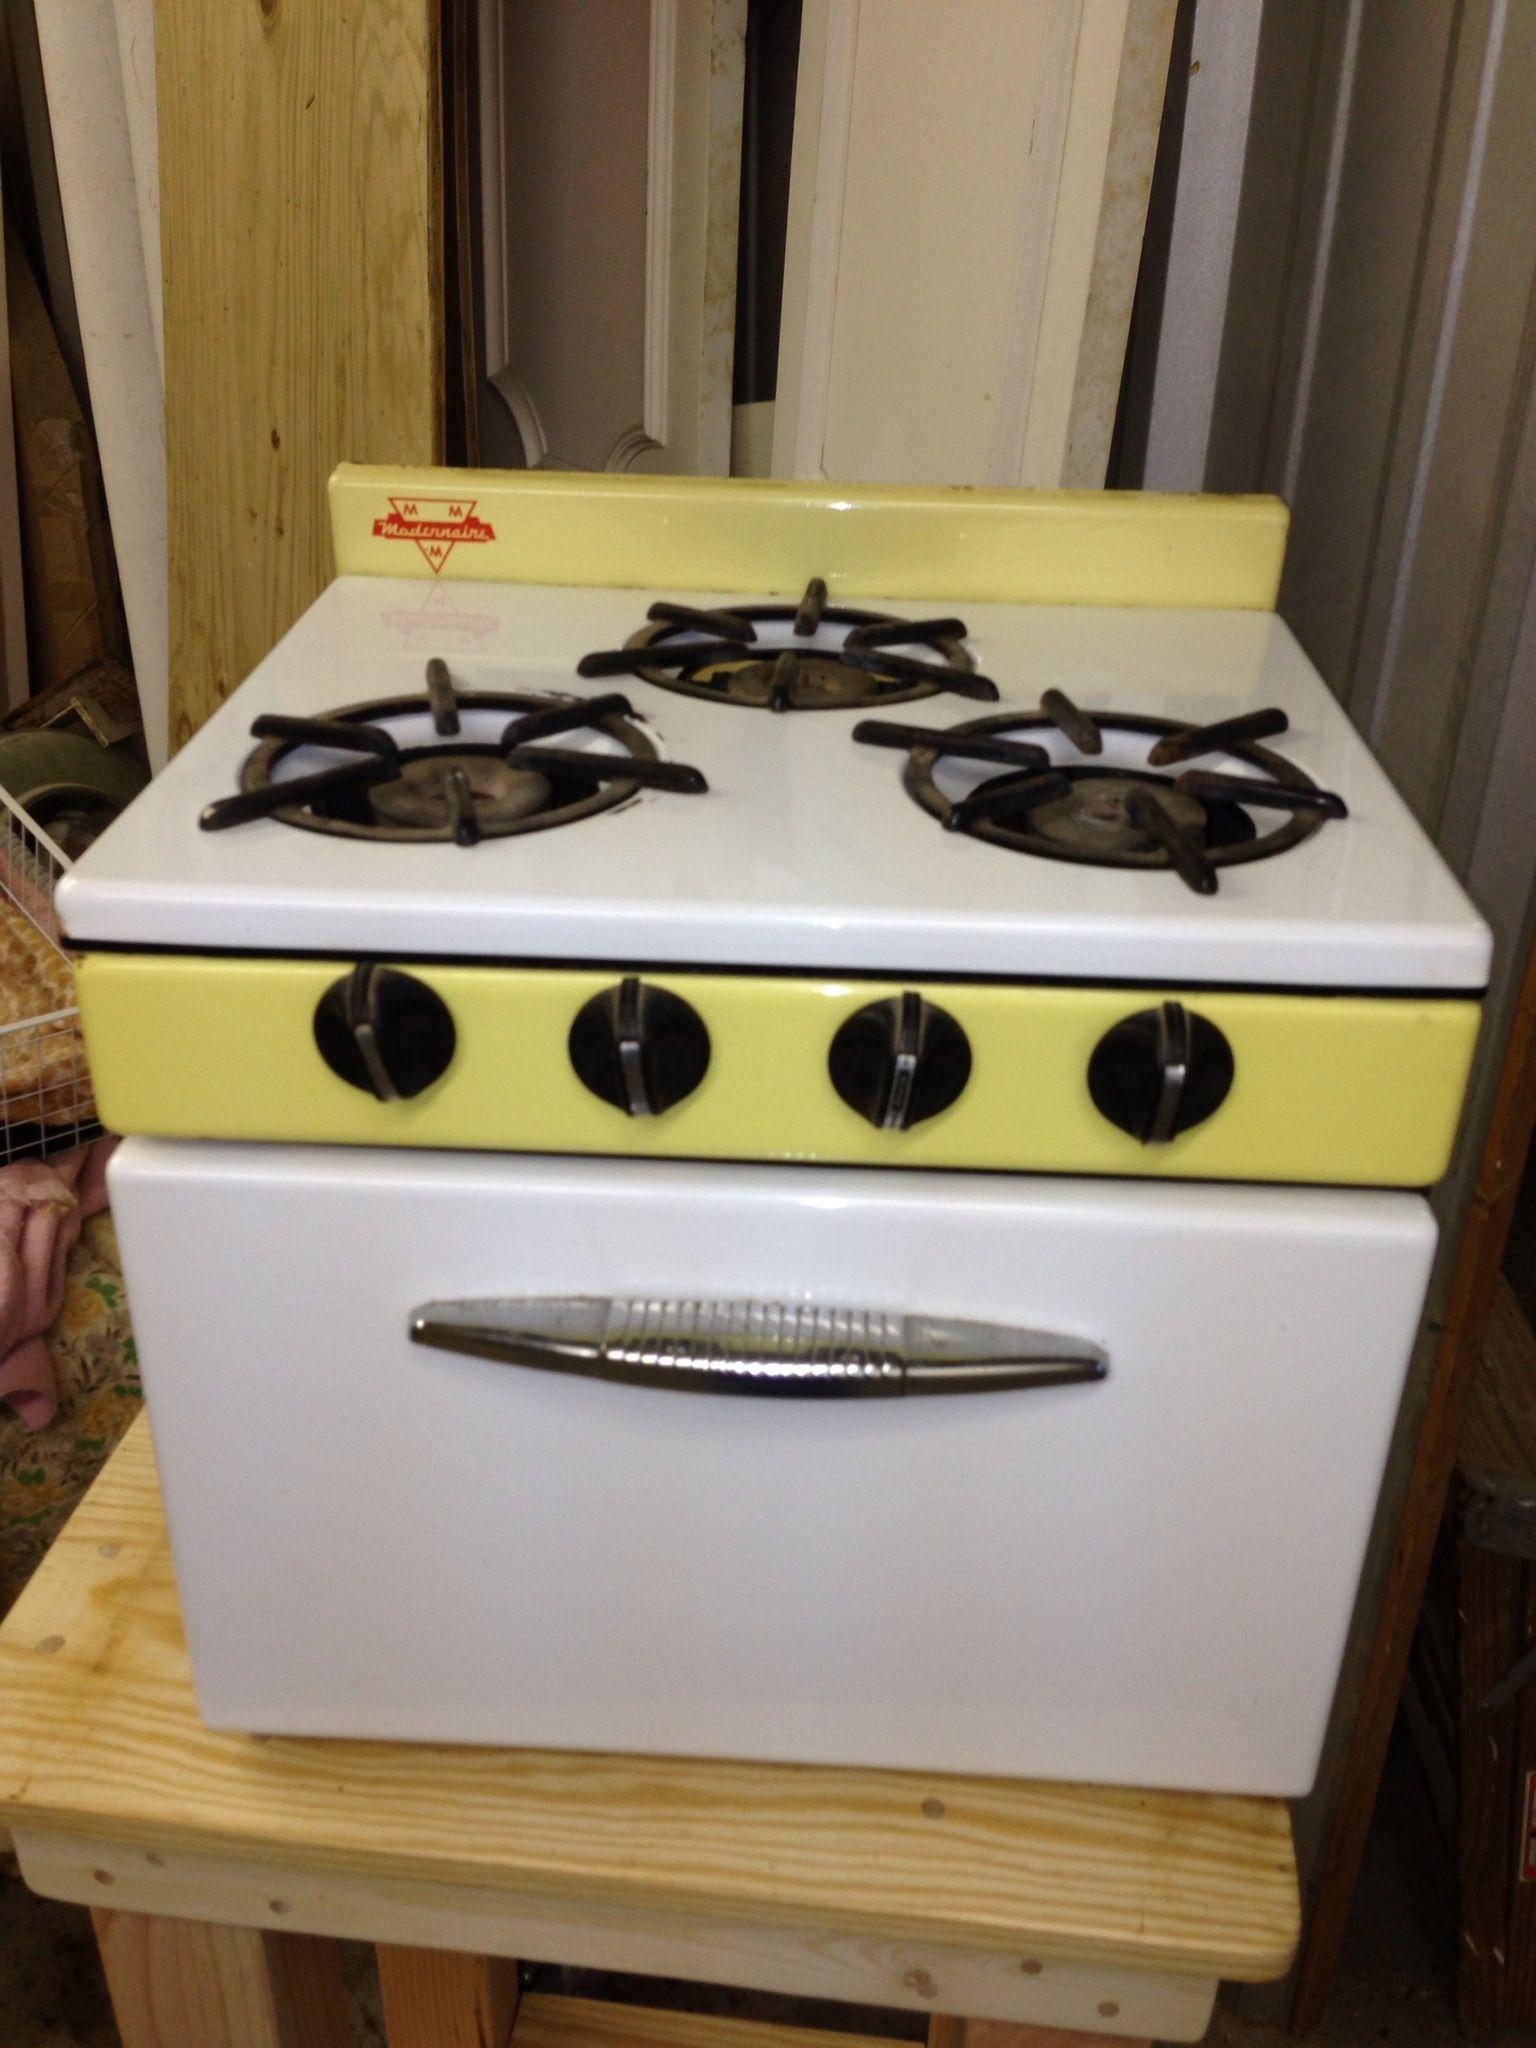 Rv Stovesovens Microwaves Parts Ppl Motor Homes >> Modernaire Oven And Stove 195 Hinz 57 Att Net Scotty Interior